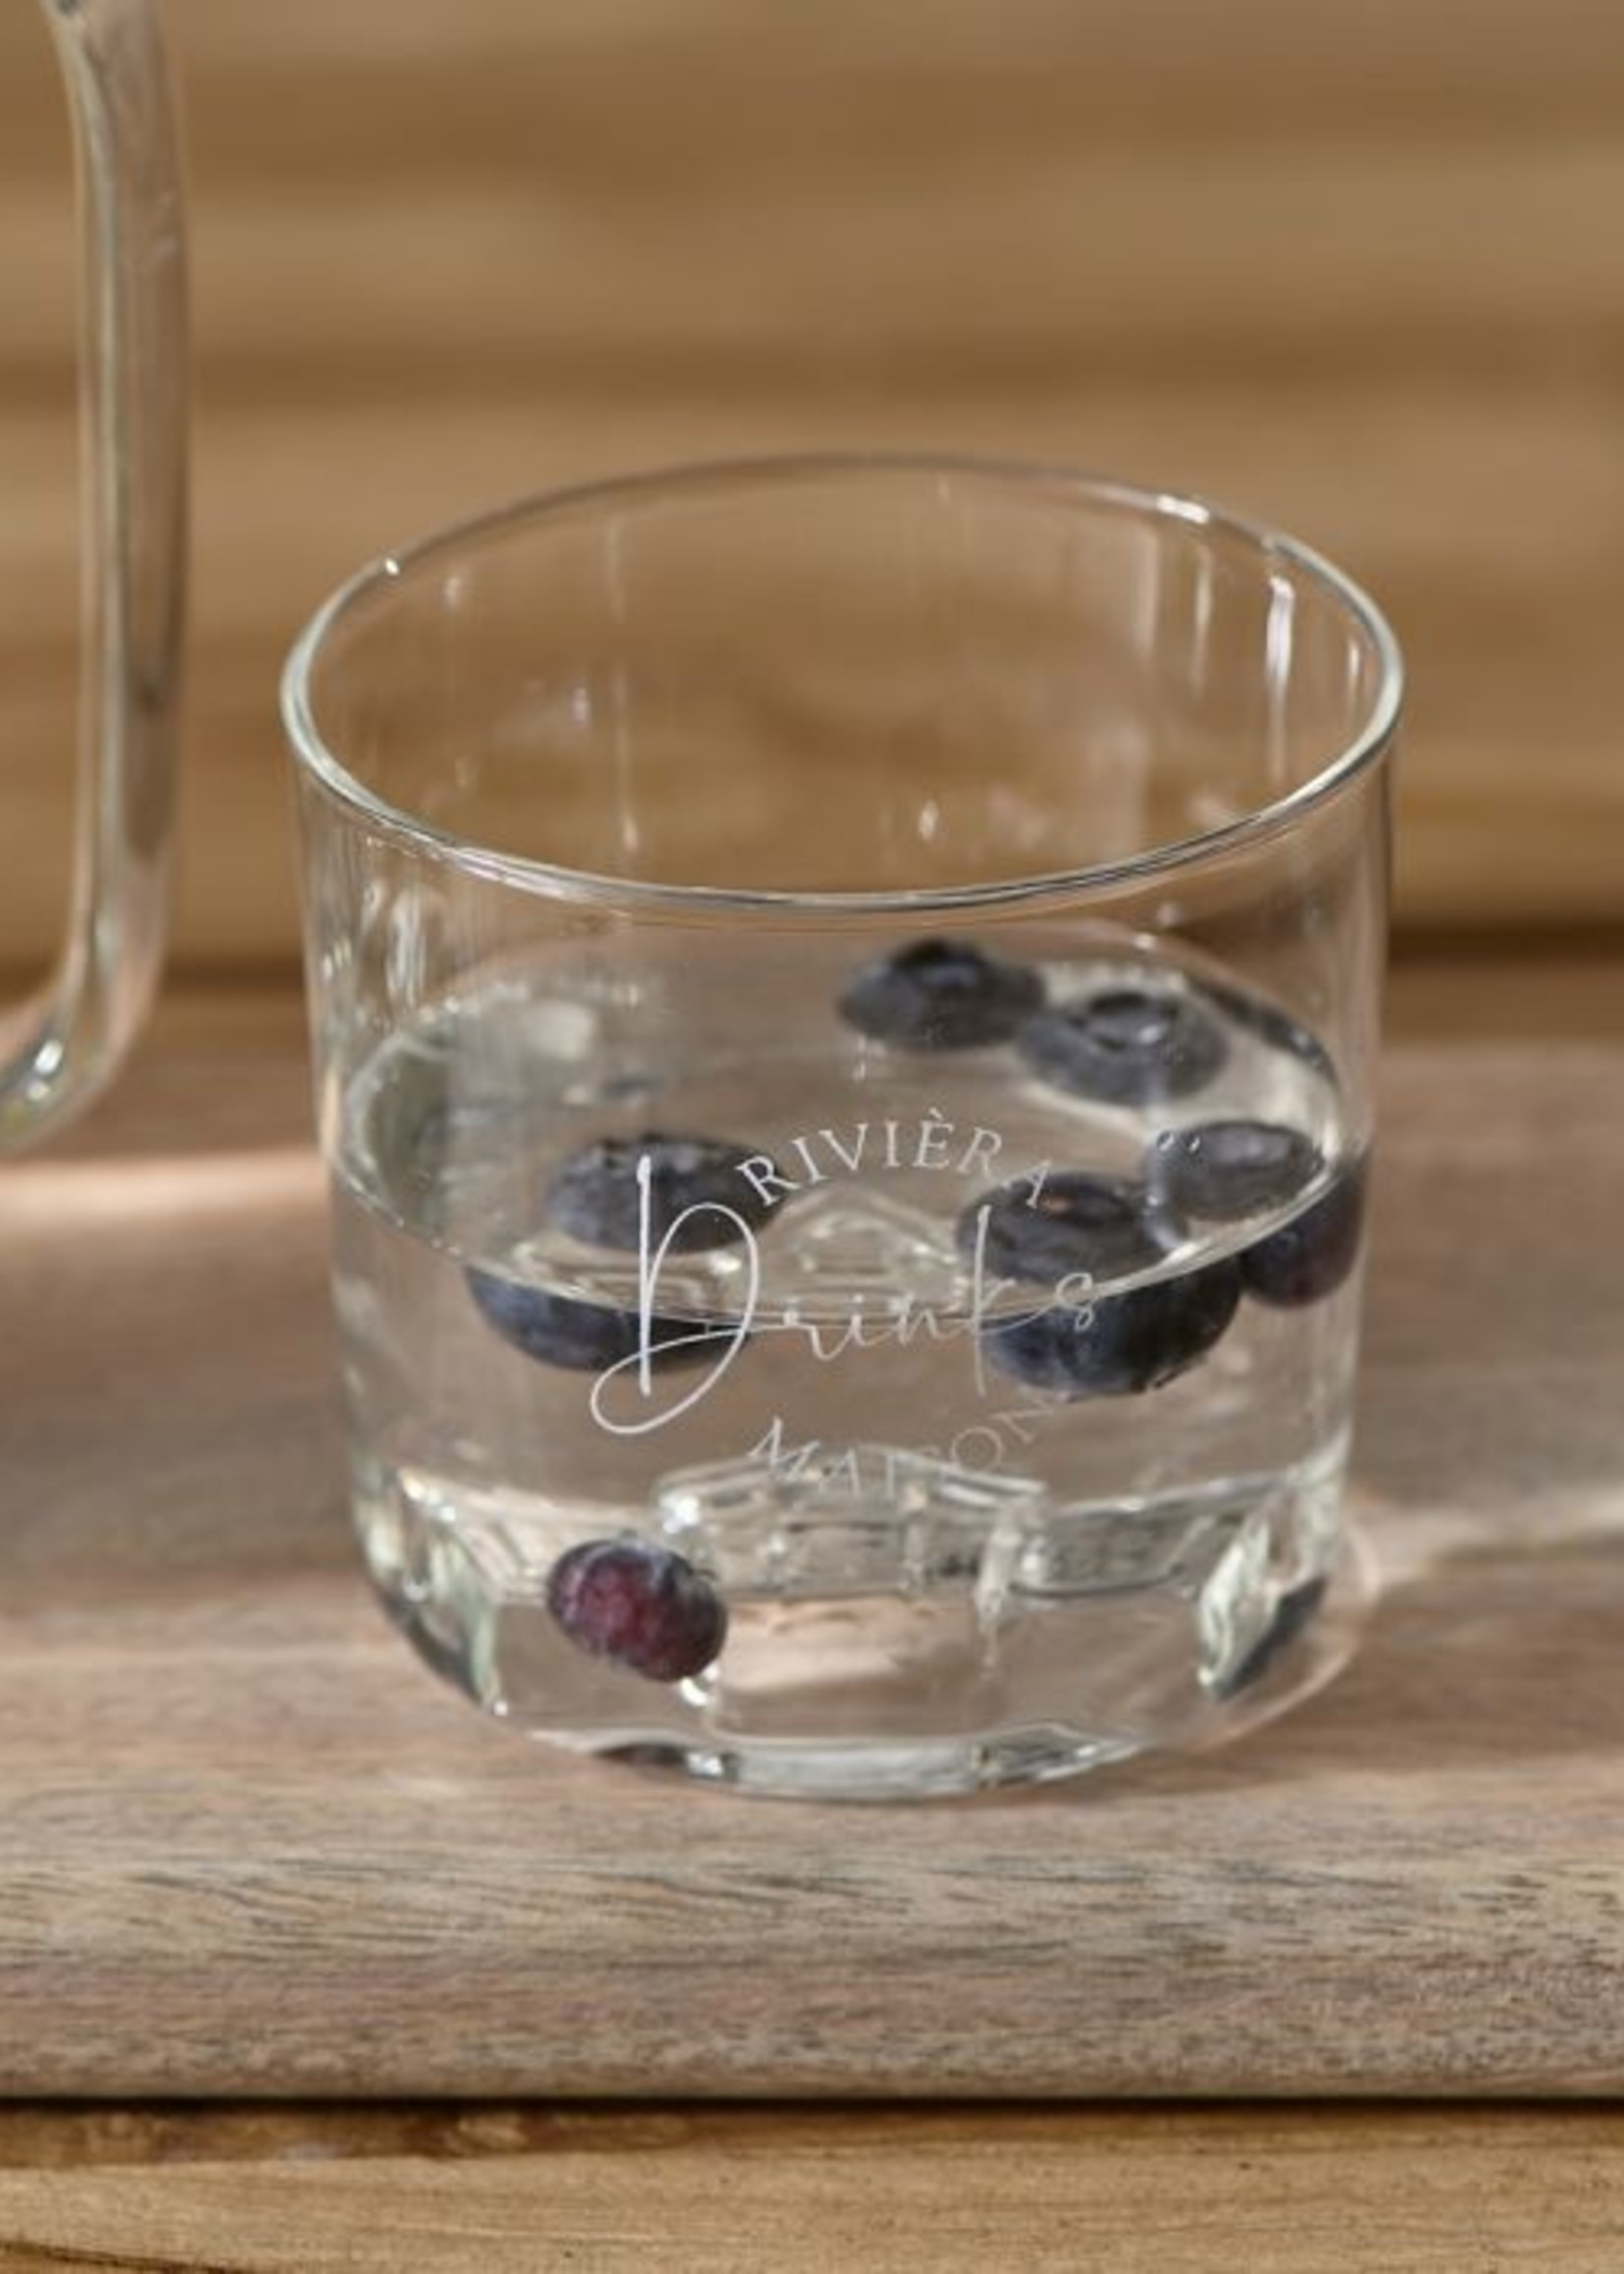 Riviera Maison RM Drinks Glass